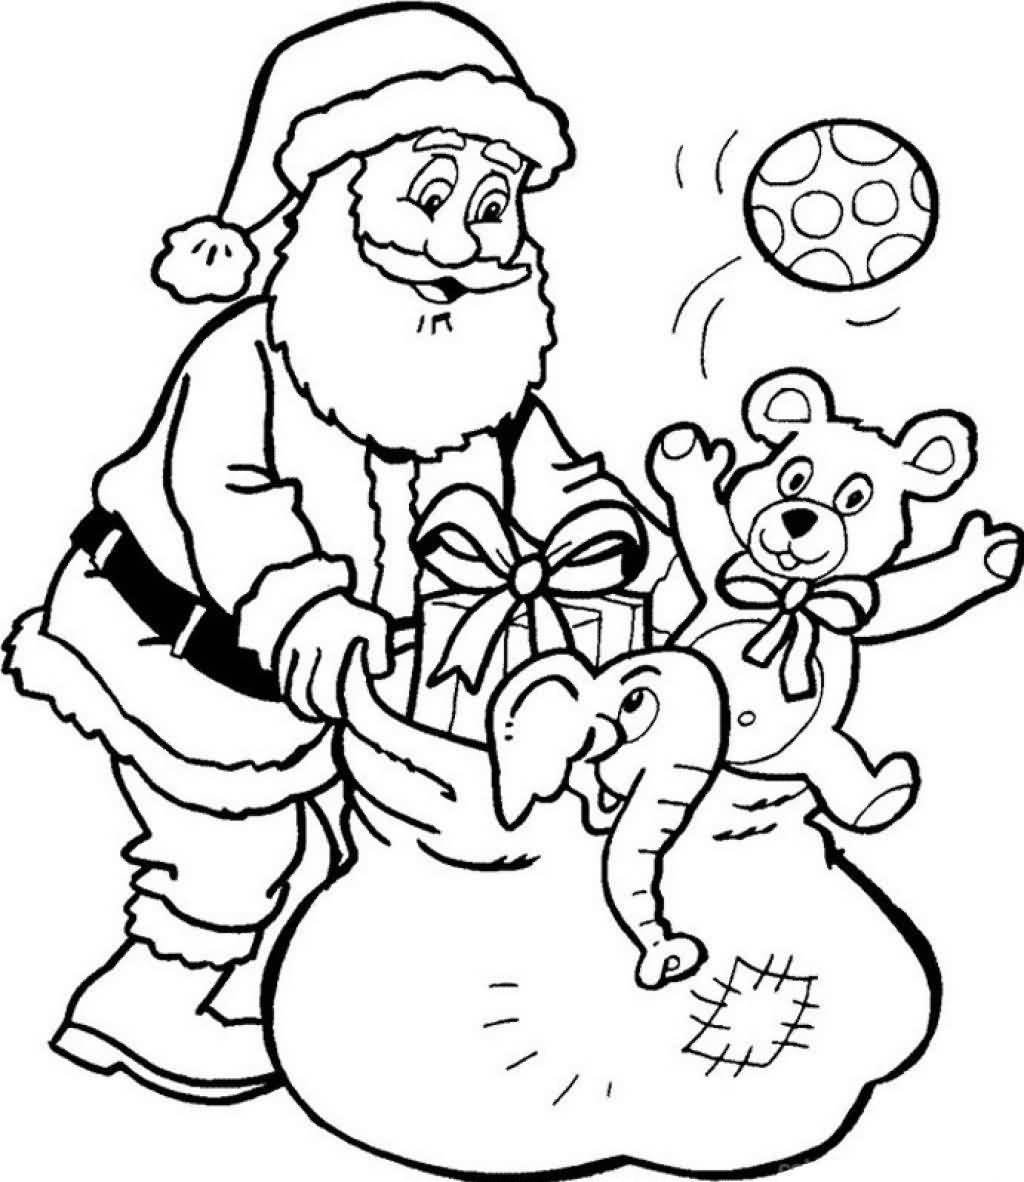 Santa Claus Coloring Pages Image Picture Photo Wallpaper 13